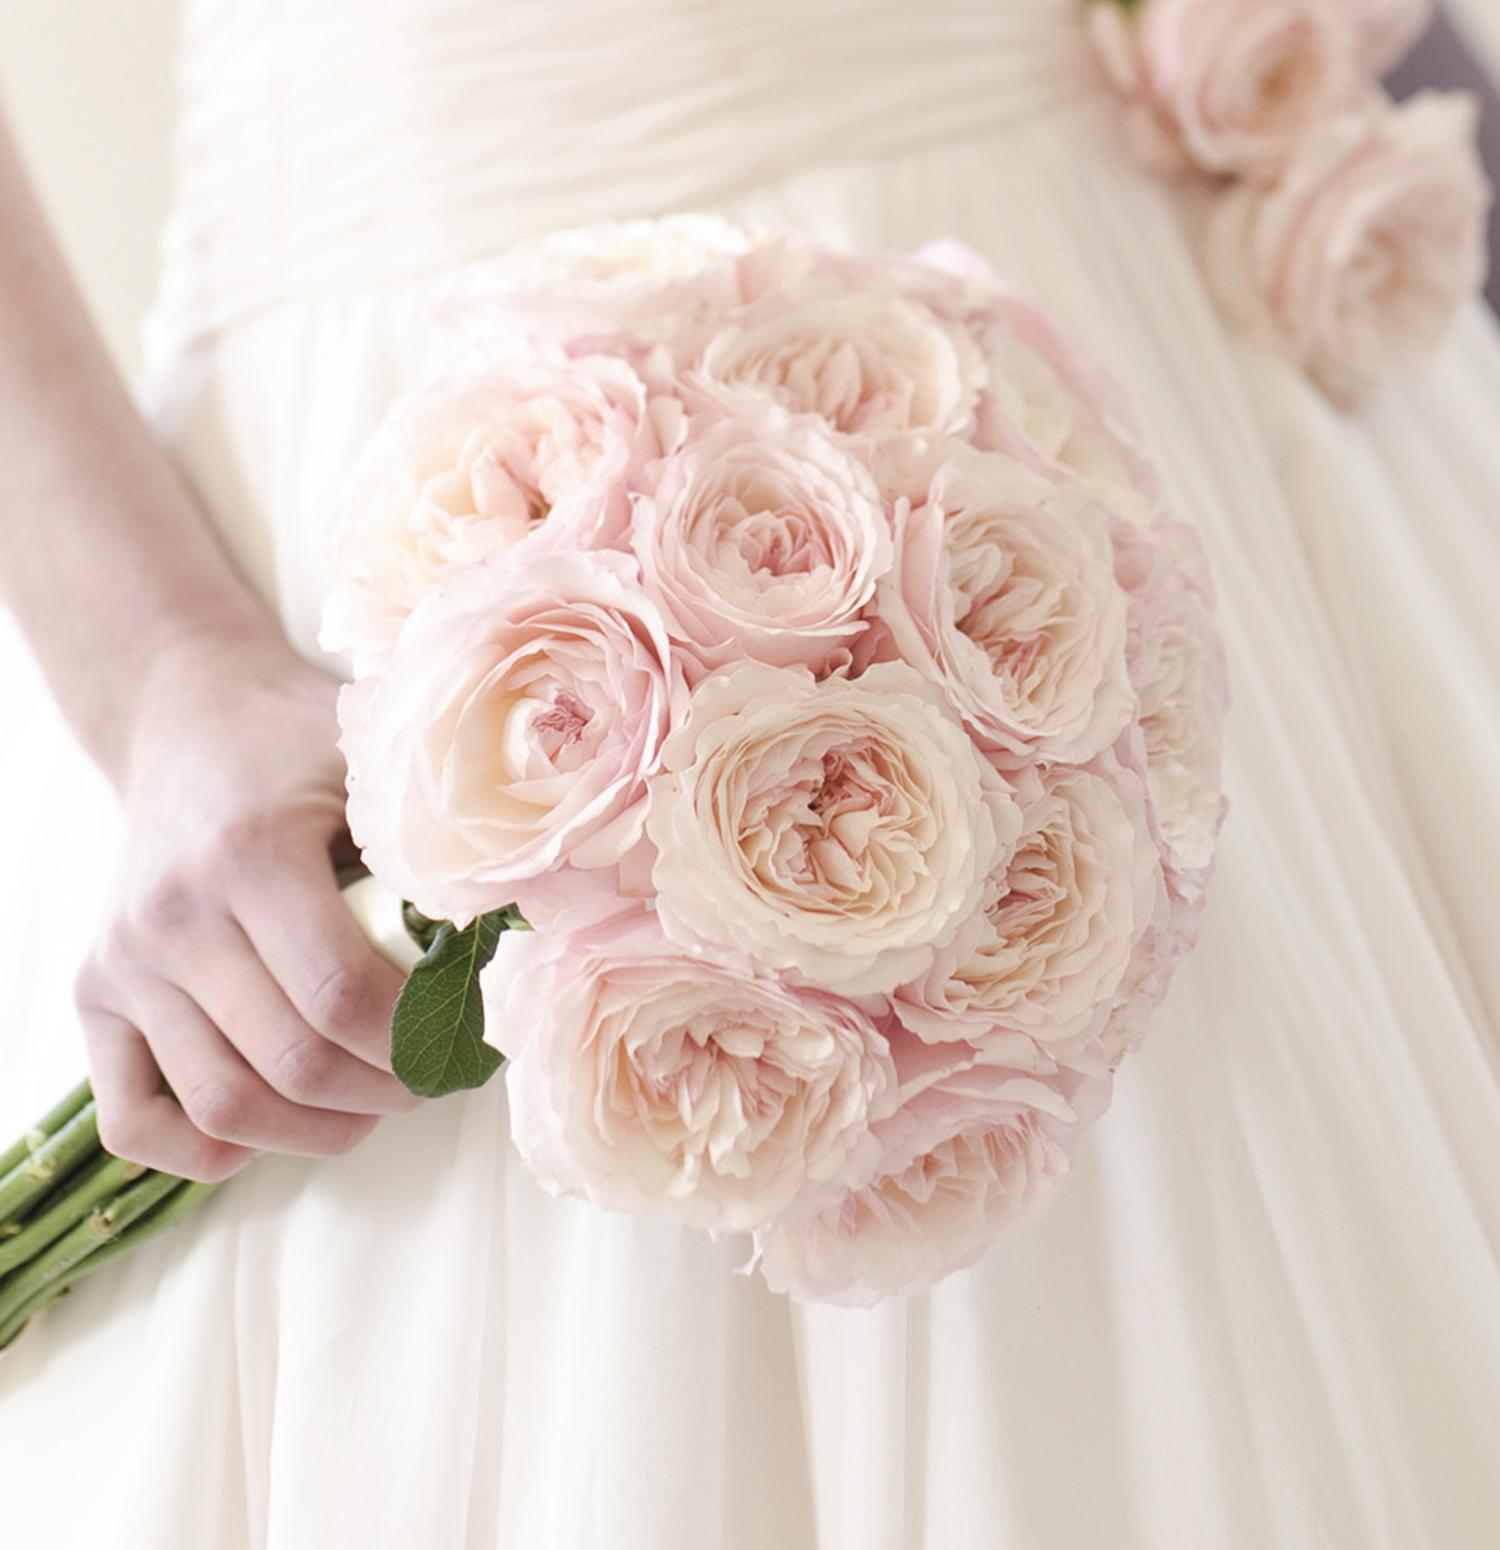 Keira Rose David Austin in Long Stemmed Bouquet